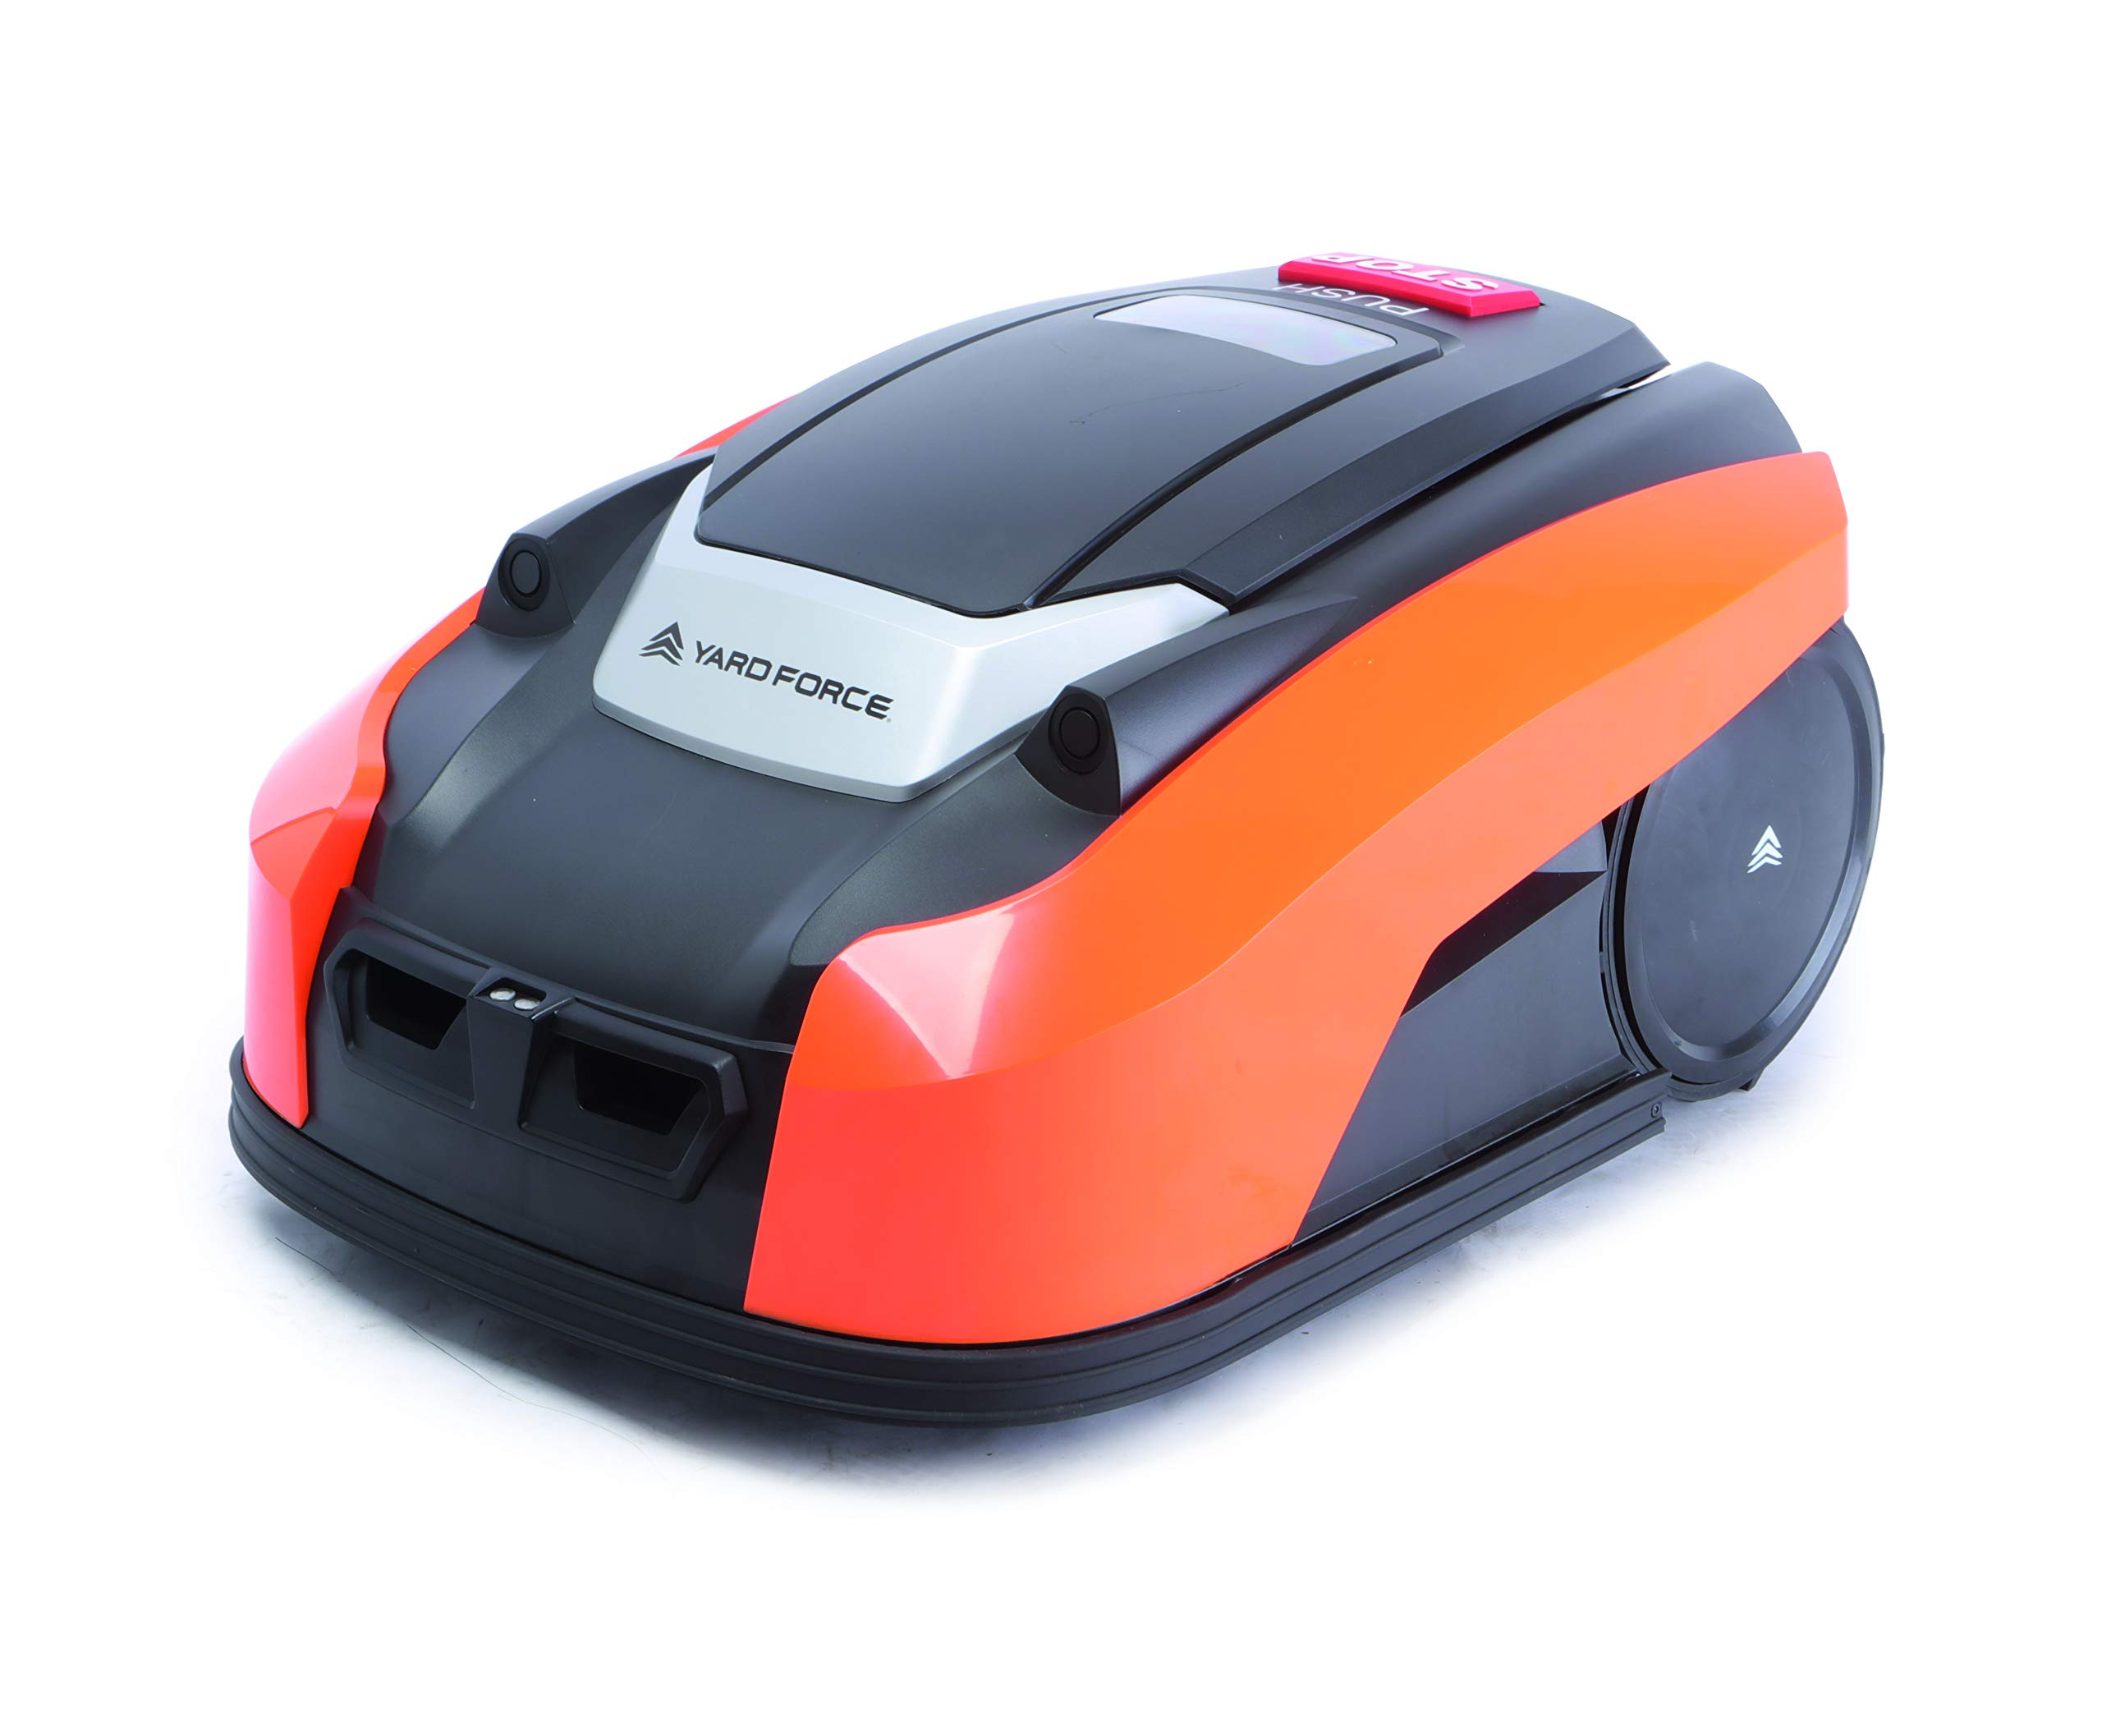 YardForce-X100i-Mhroboter–Selbstfahrender-City-Rasenmher-Roboter-mit-Begrenzungsdraht–Akku-Rasenroboter-fr-bis-zu-400m-Rasen-25-Steigung-28-V-schwarzorange